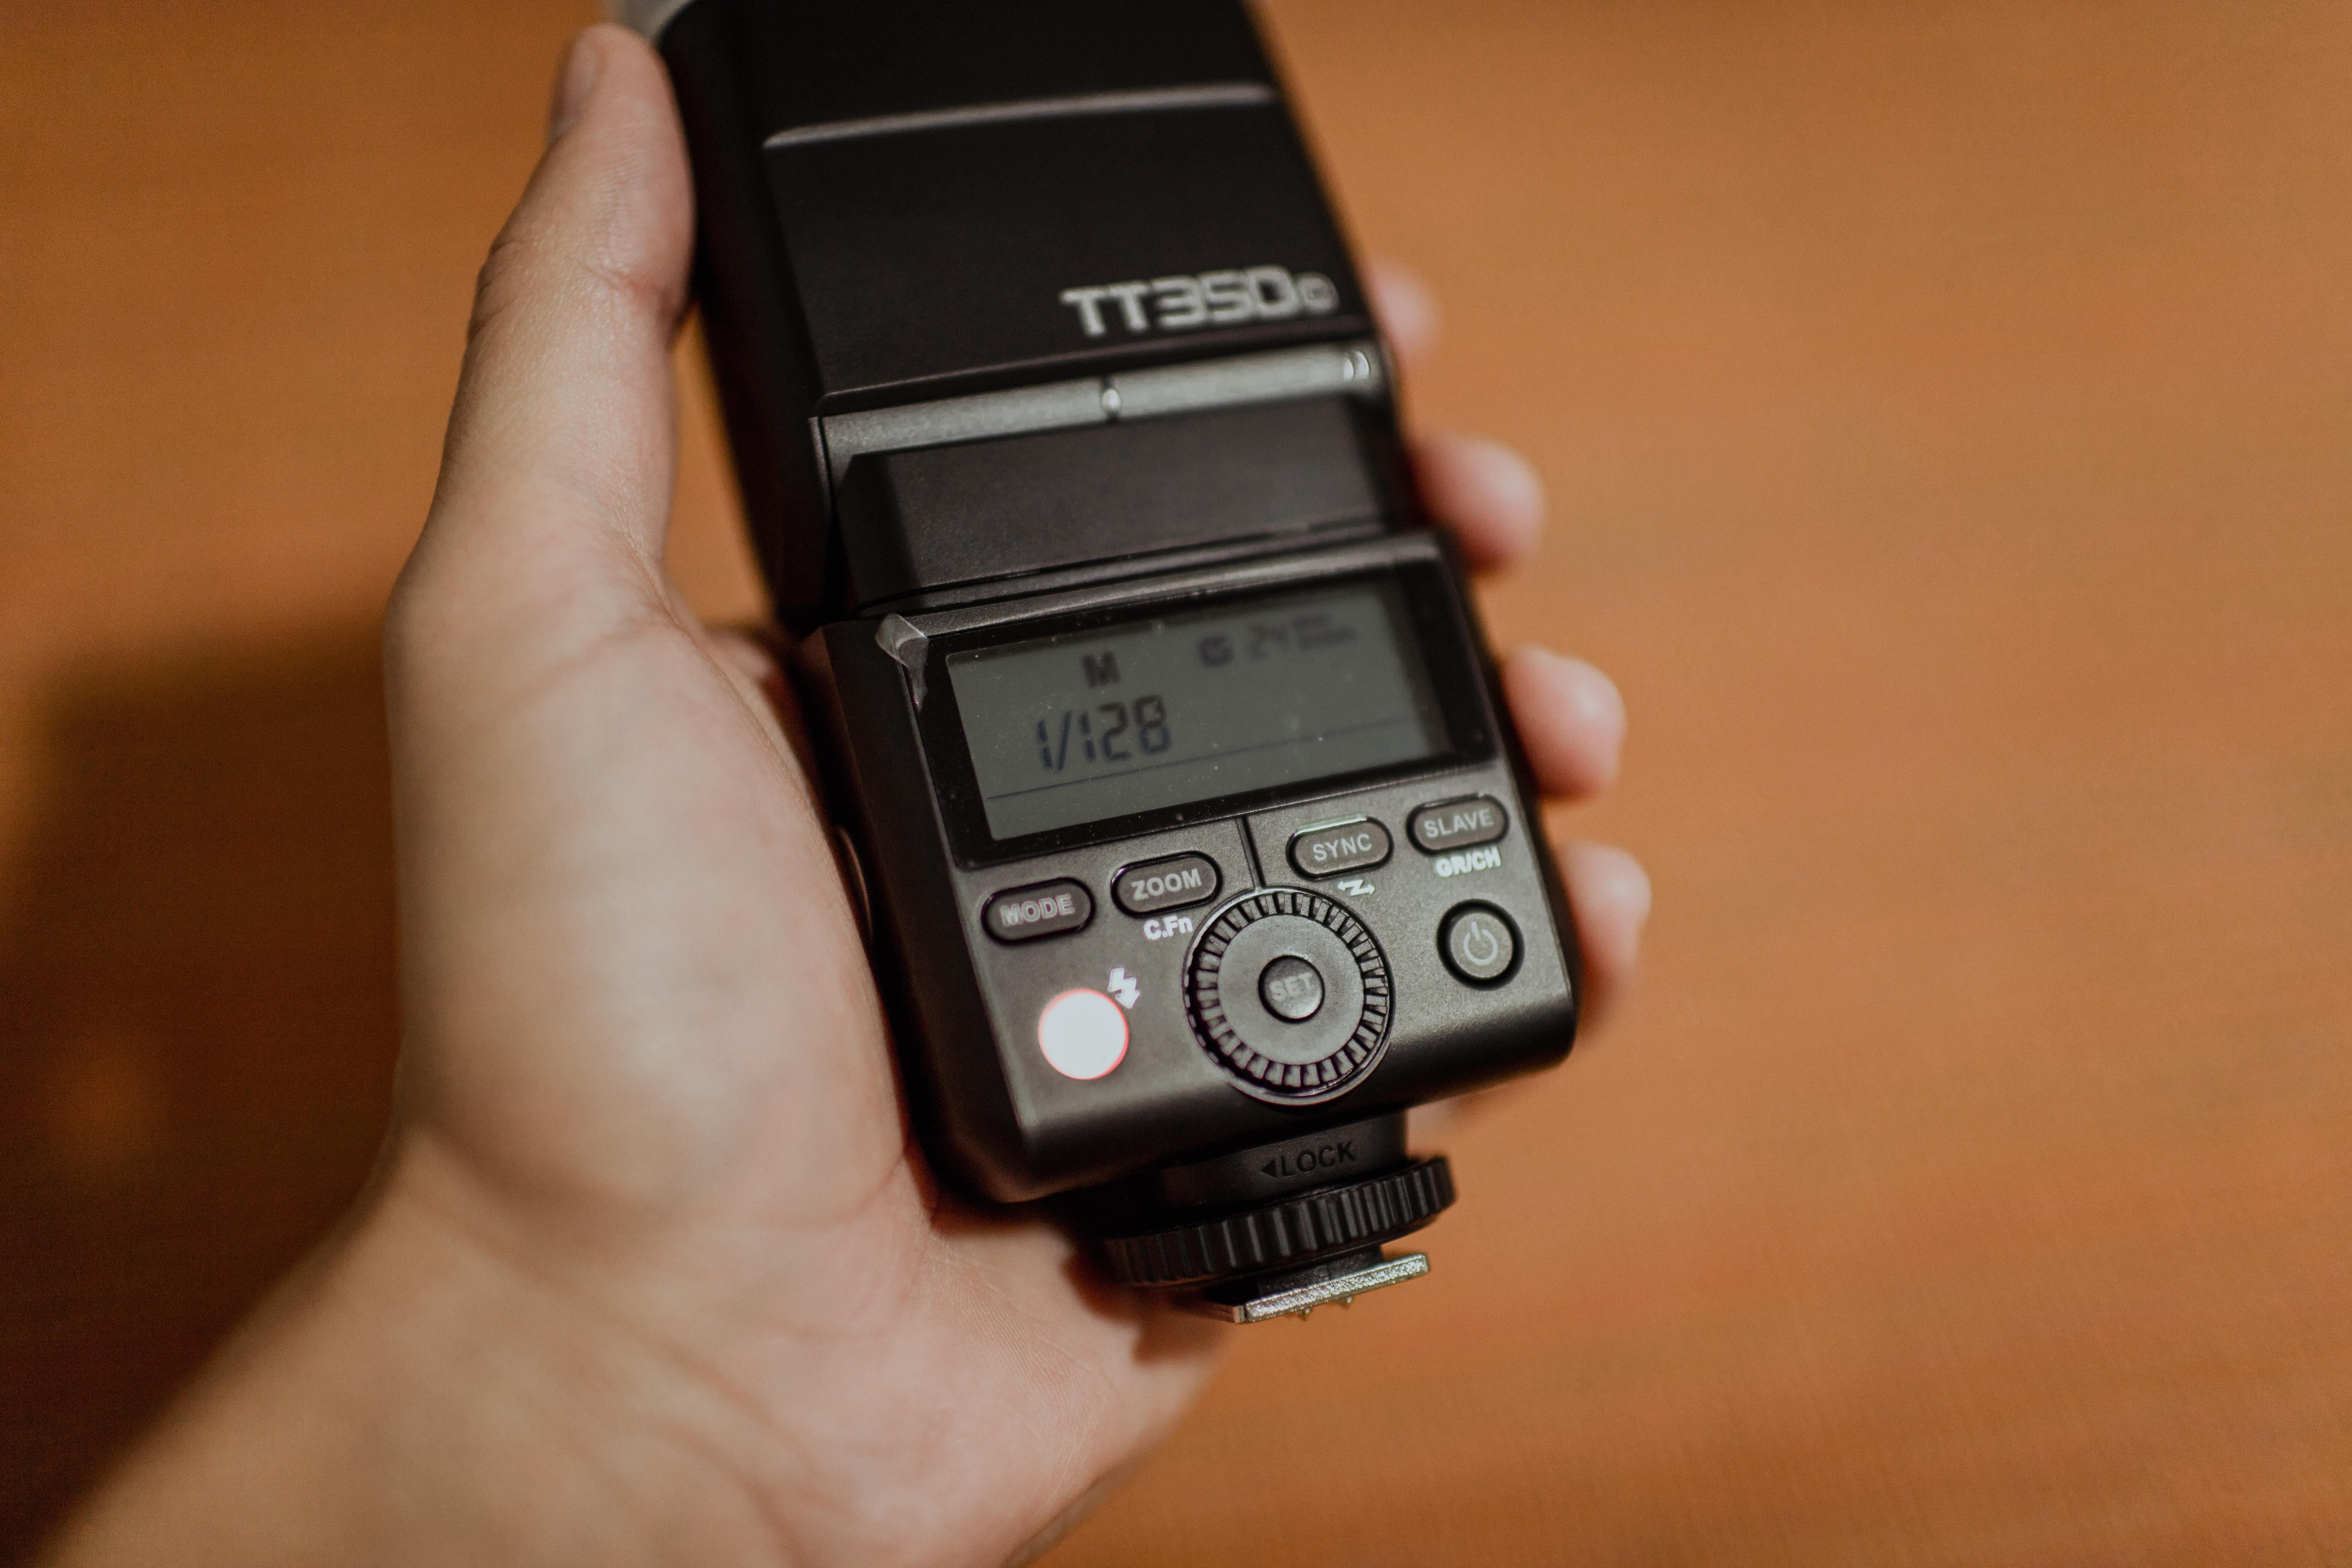 Black Tt350 Camera Flash Unit